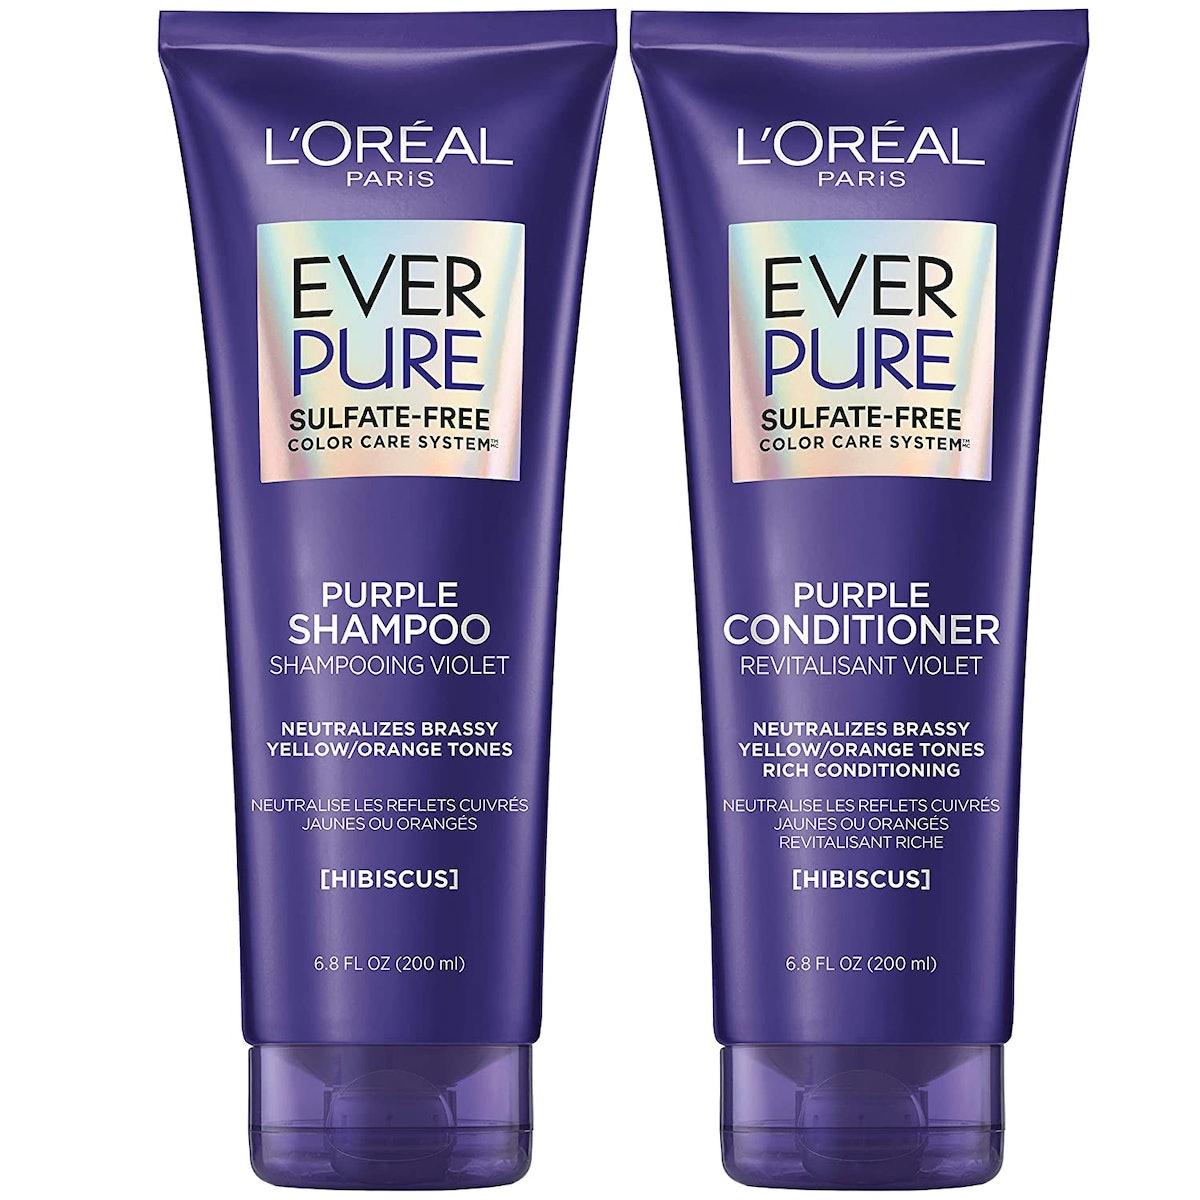 L'Oreal Paris EverPure Sulfate-Free Purple Shampoo & Conditioner (Set of 2)